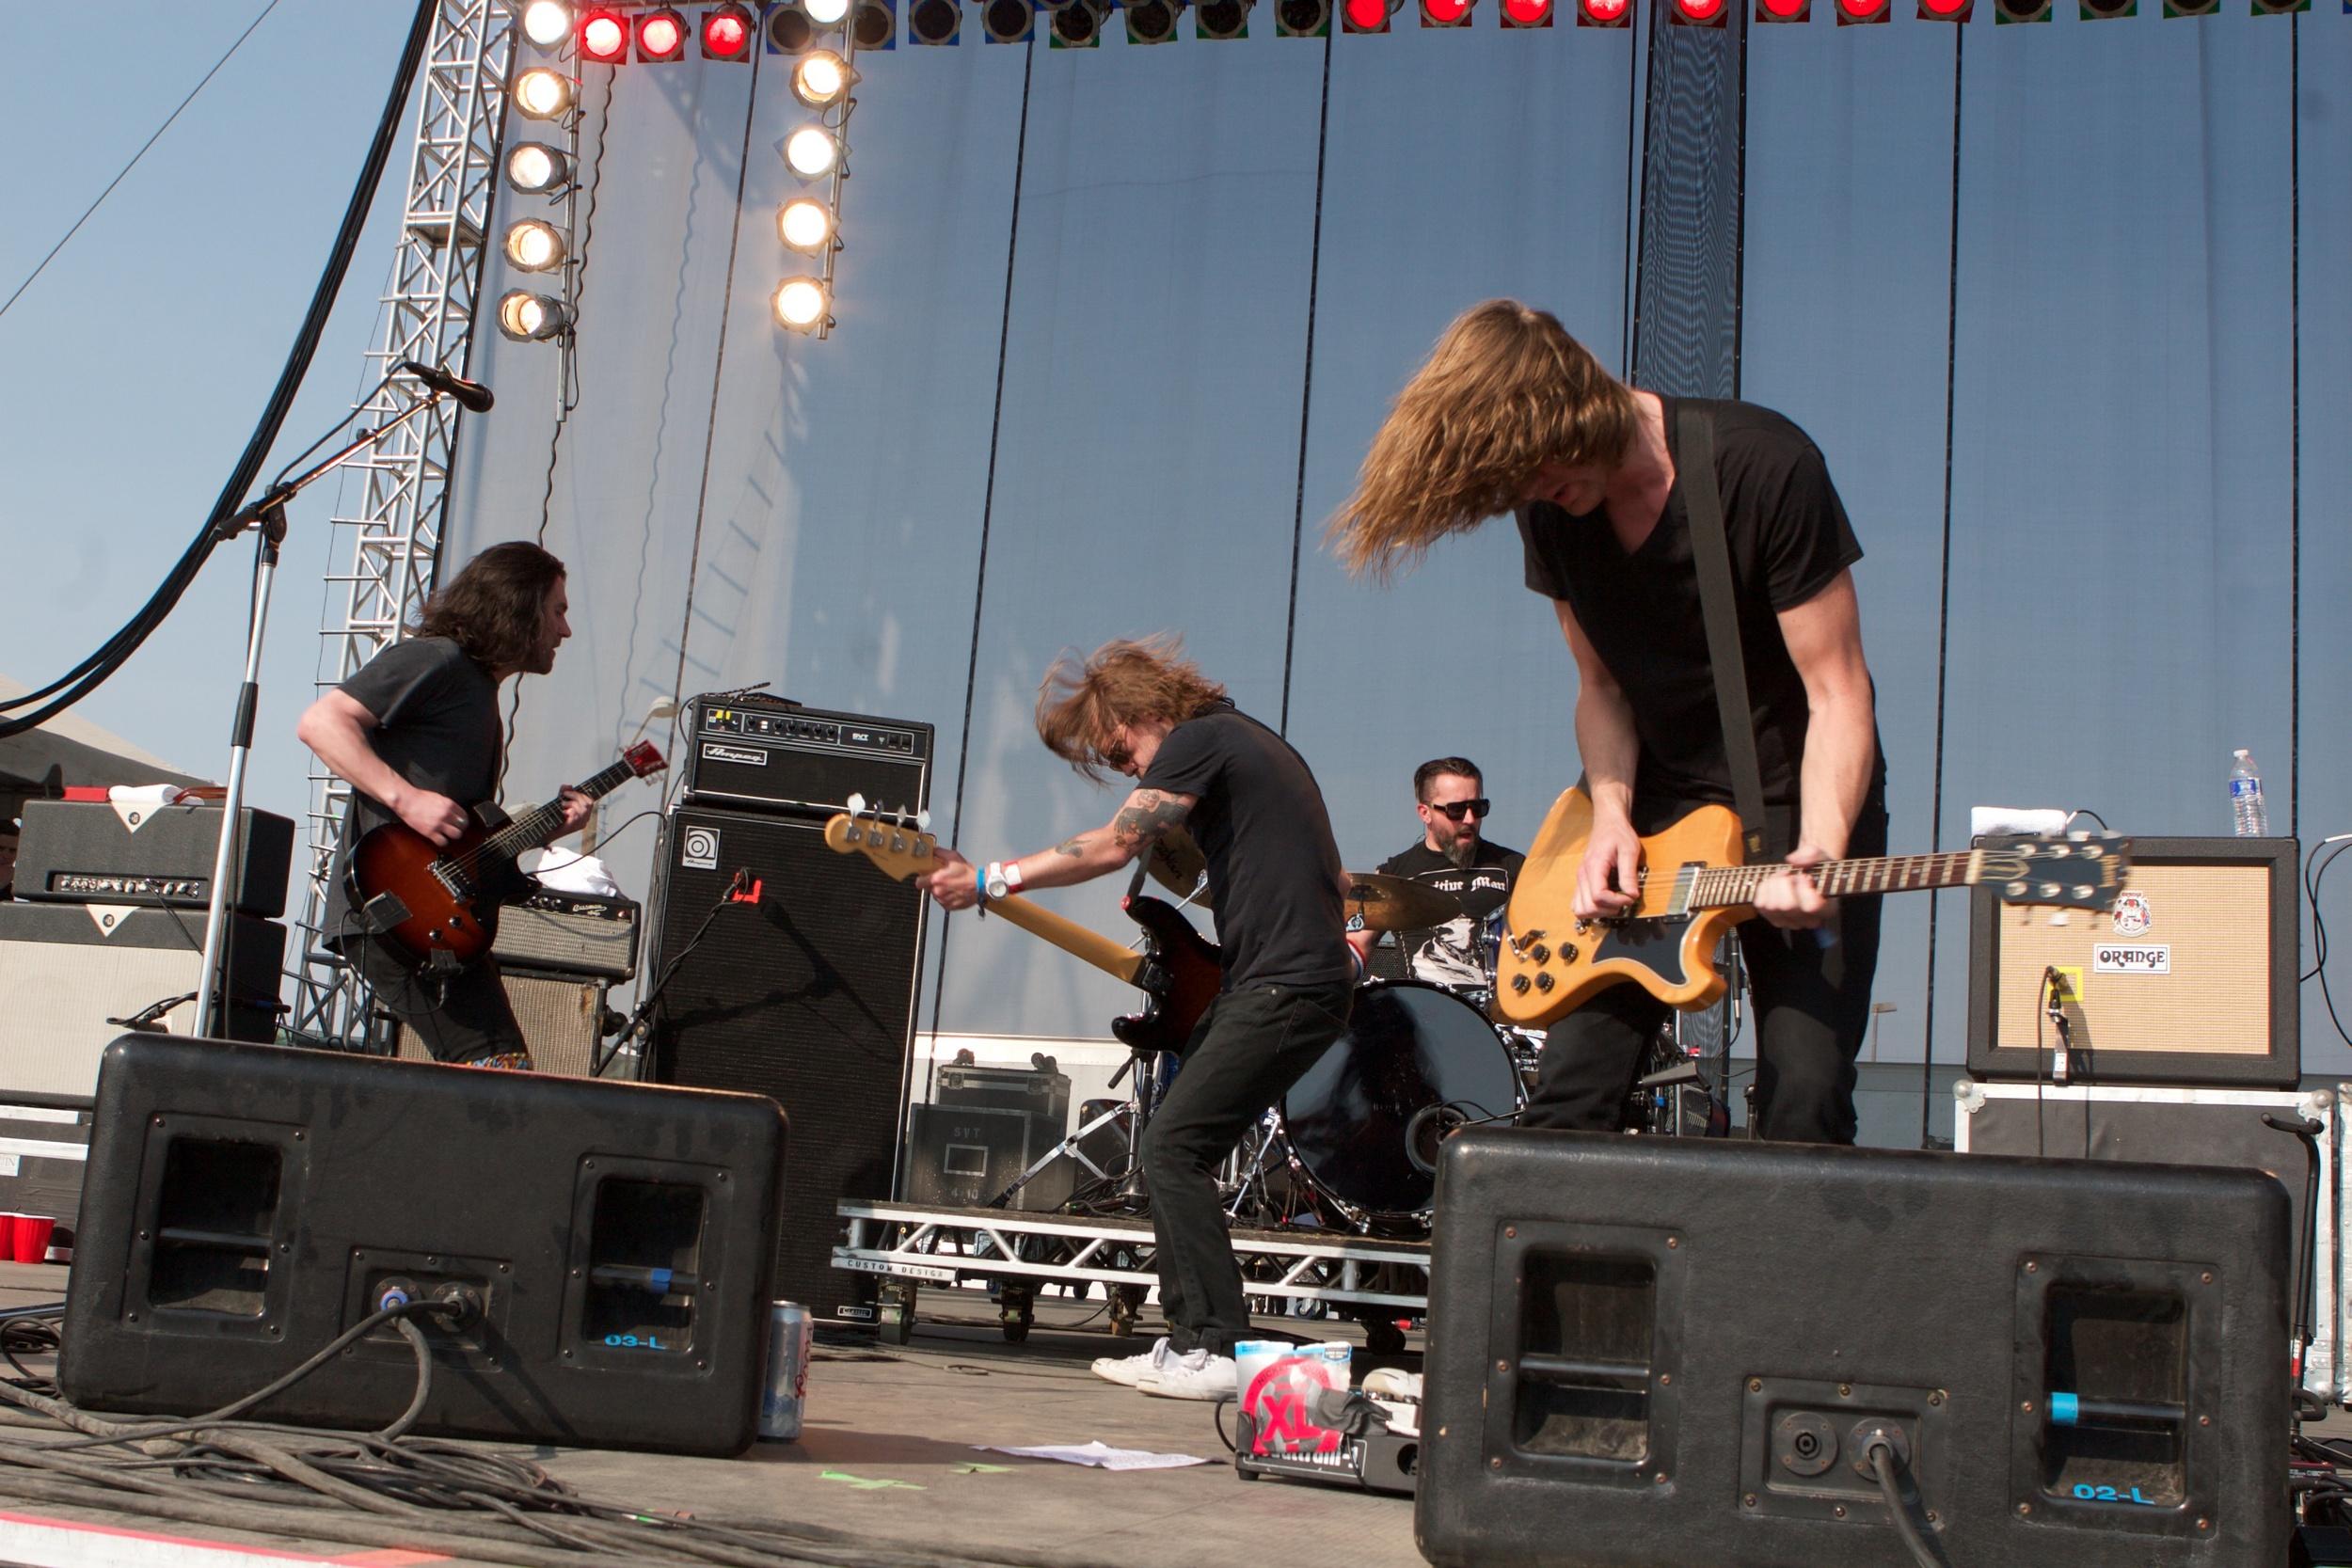 Desaparecidos rocking out. (Photo Credit: Matt Smith)